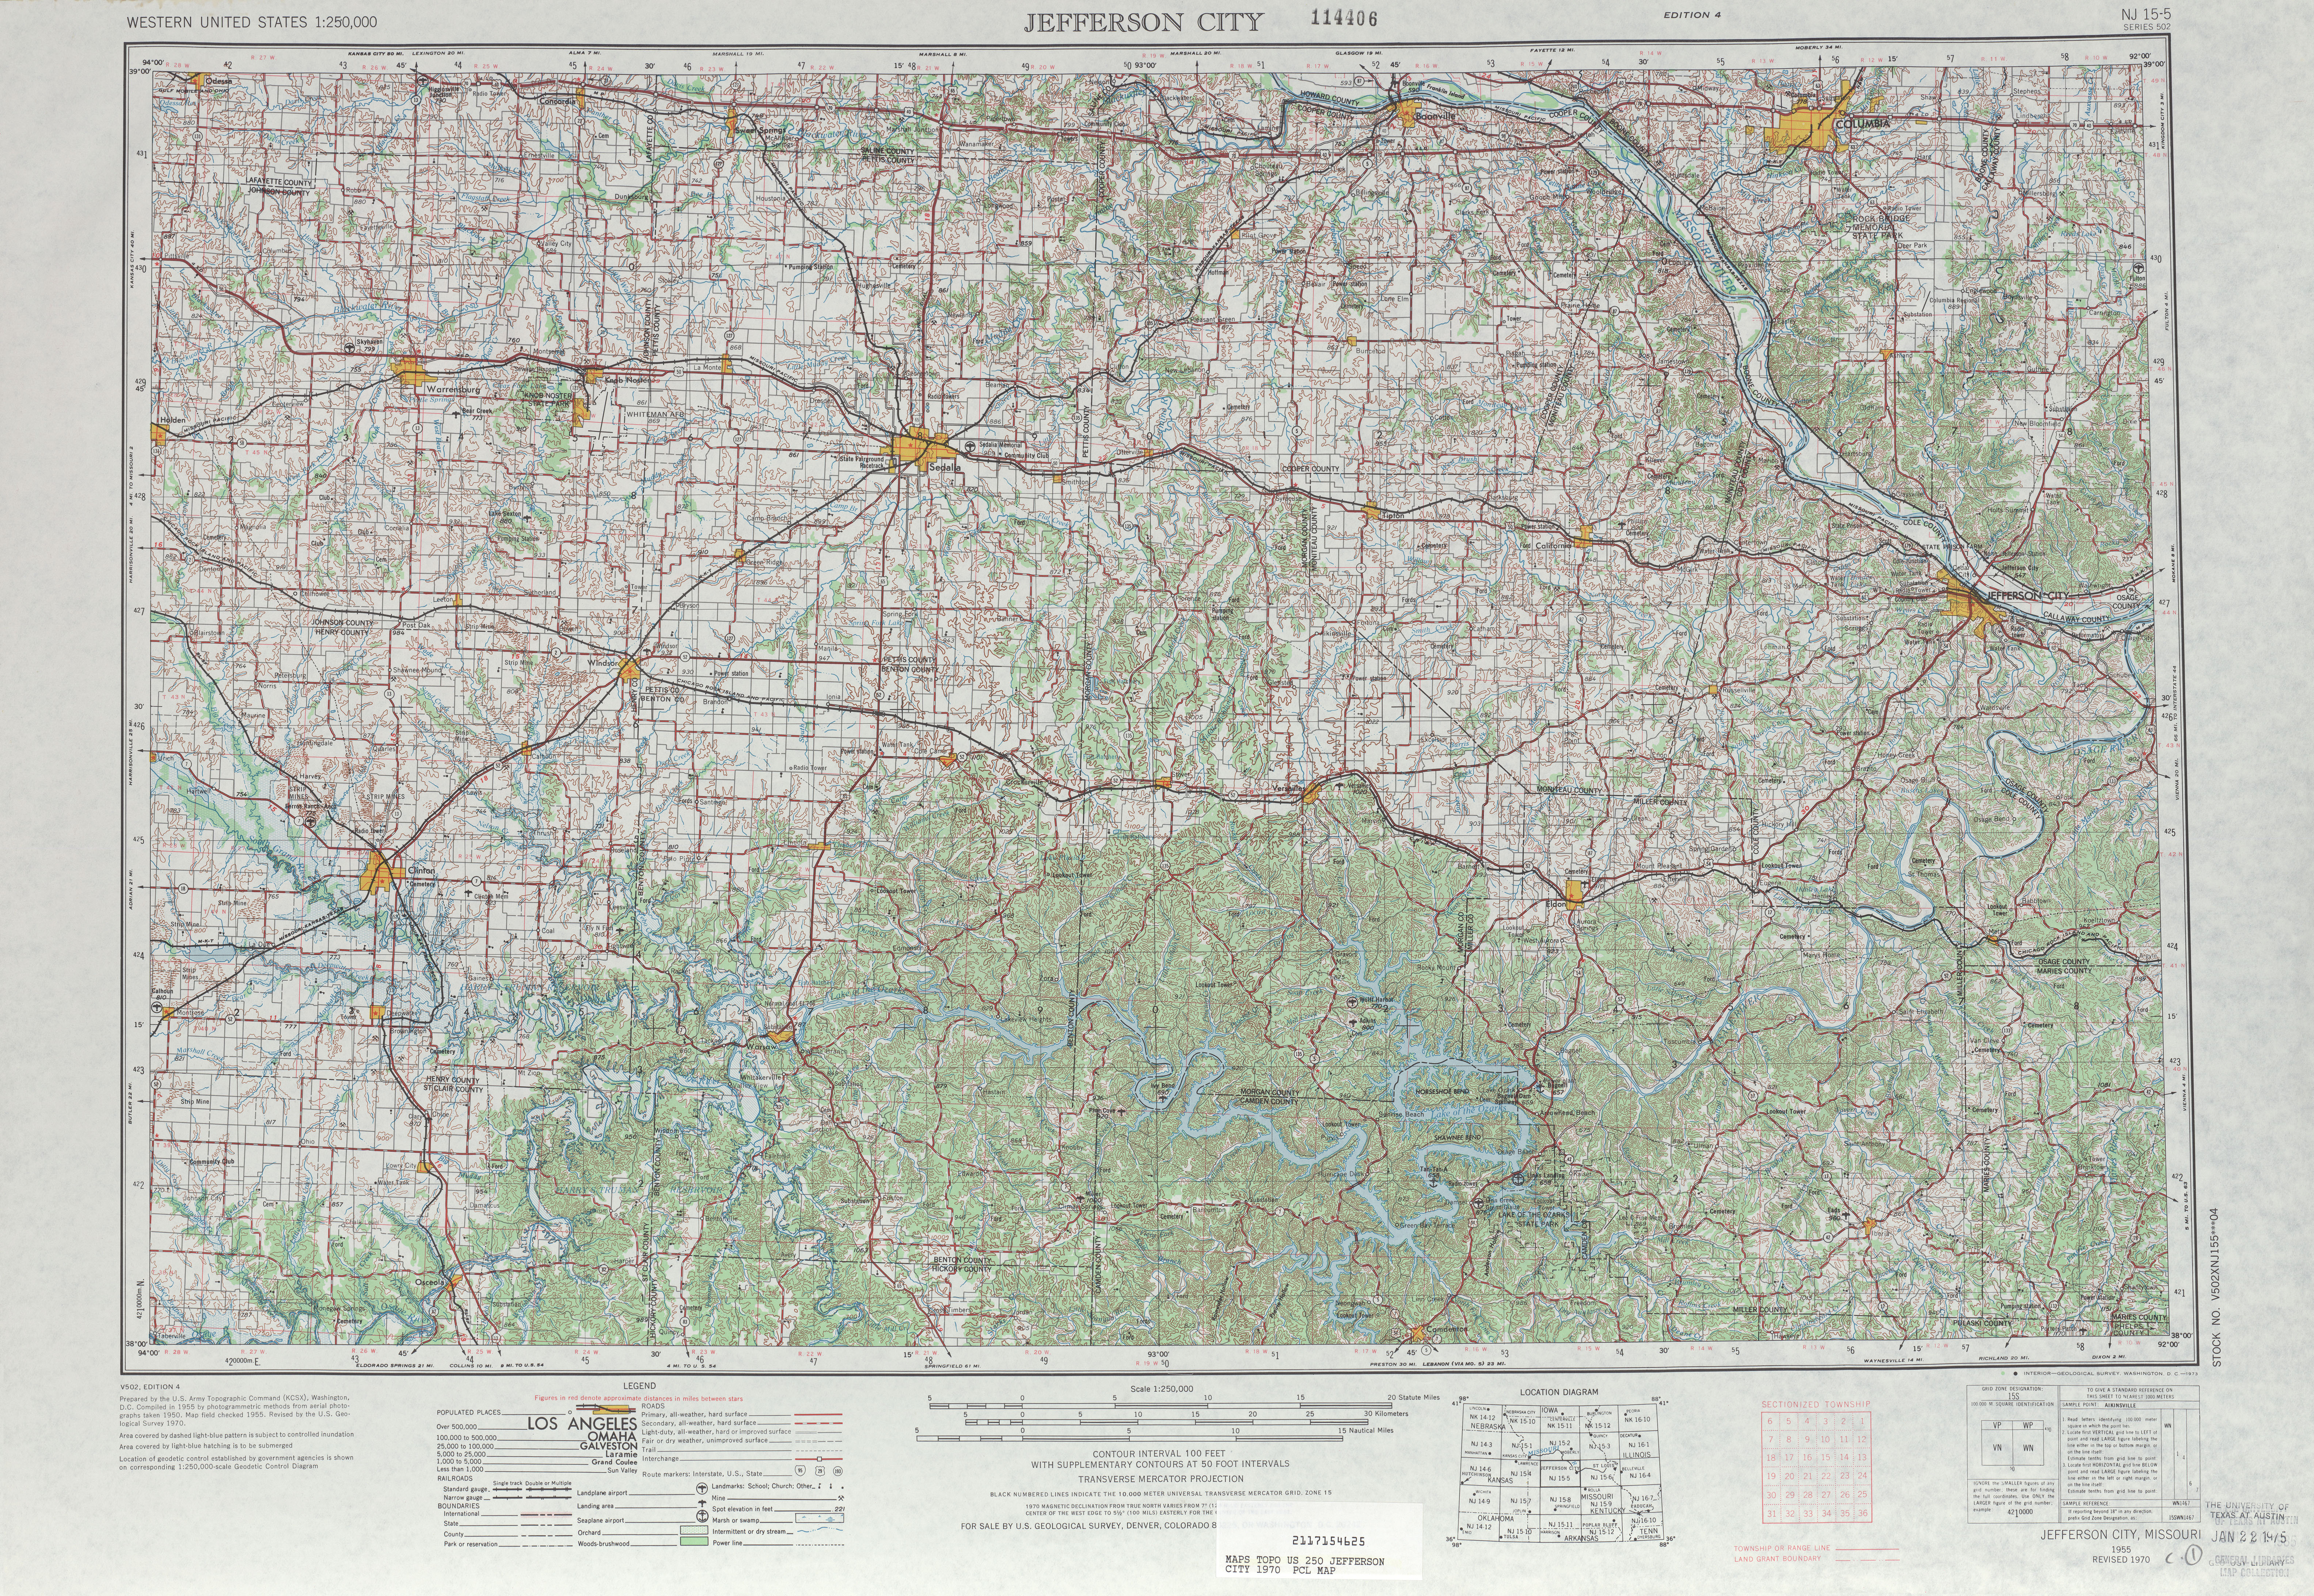 Jefferson City Topographic Map Sheet, United States 1970